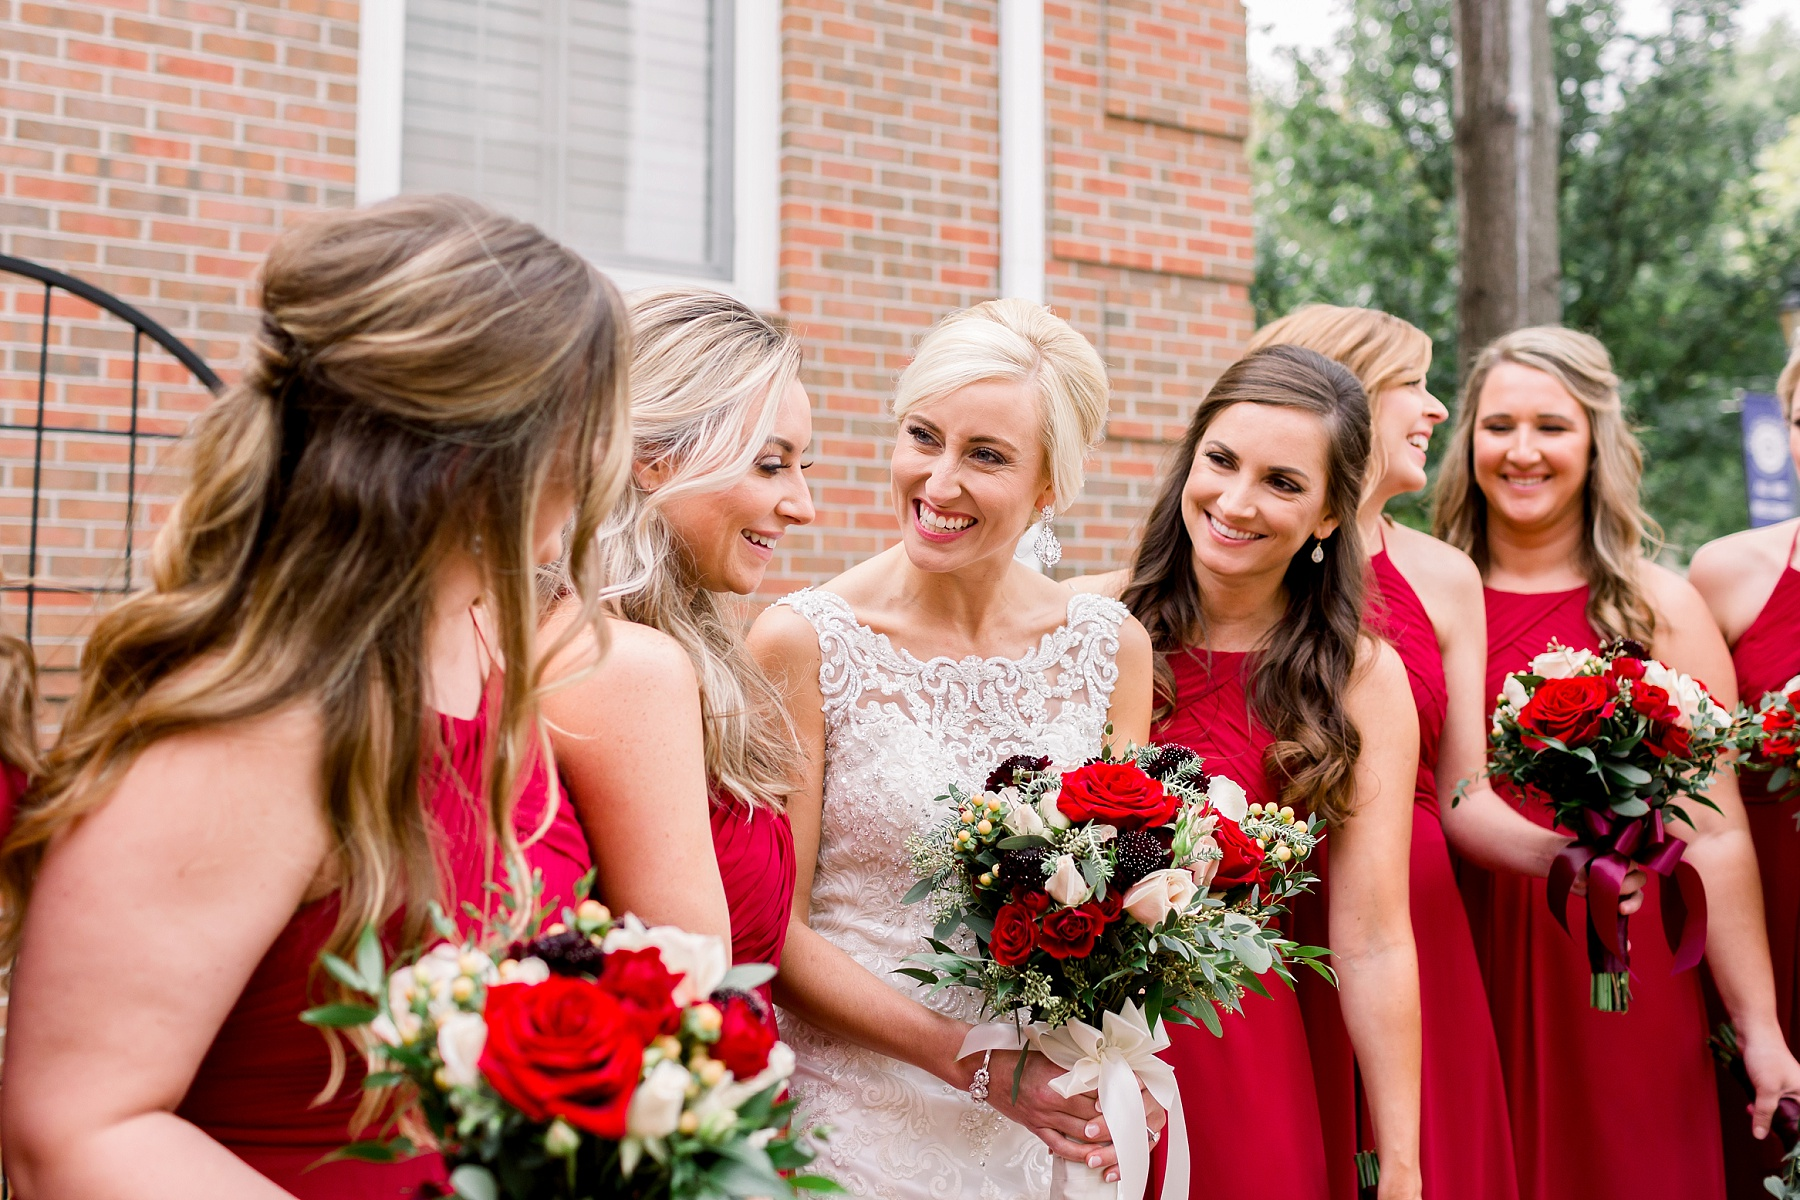 midwest-adventurous-wedding-photographer-elizabeth-ladean-photography-photo_4825.jpg